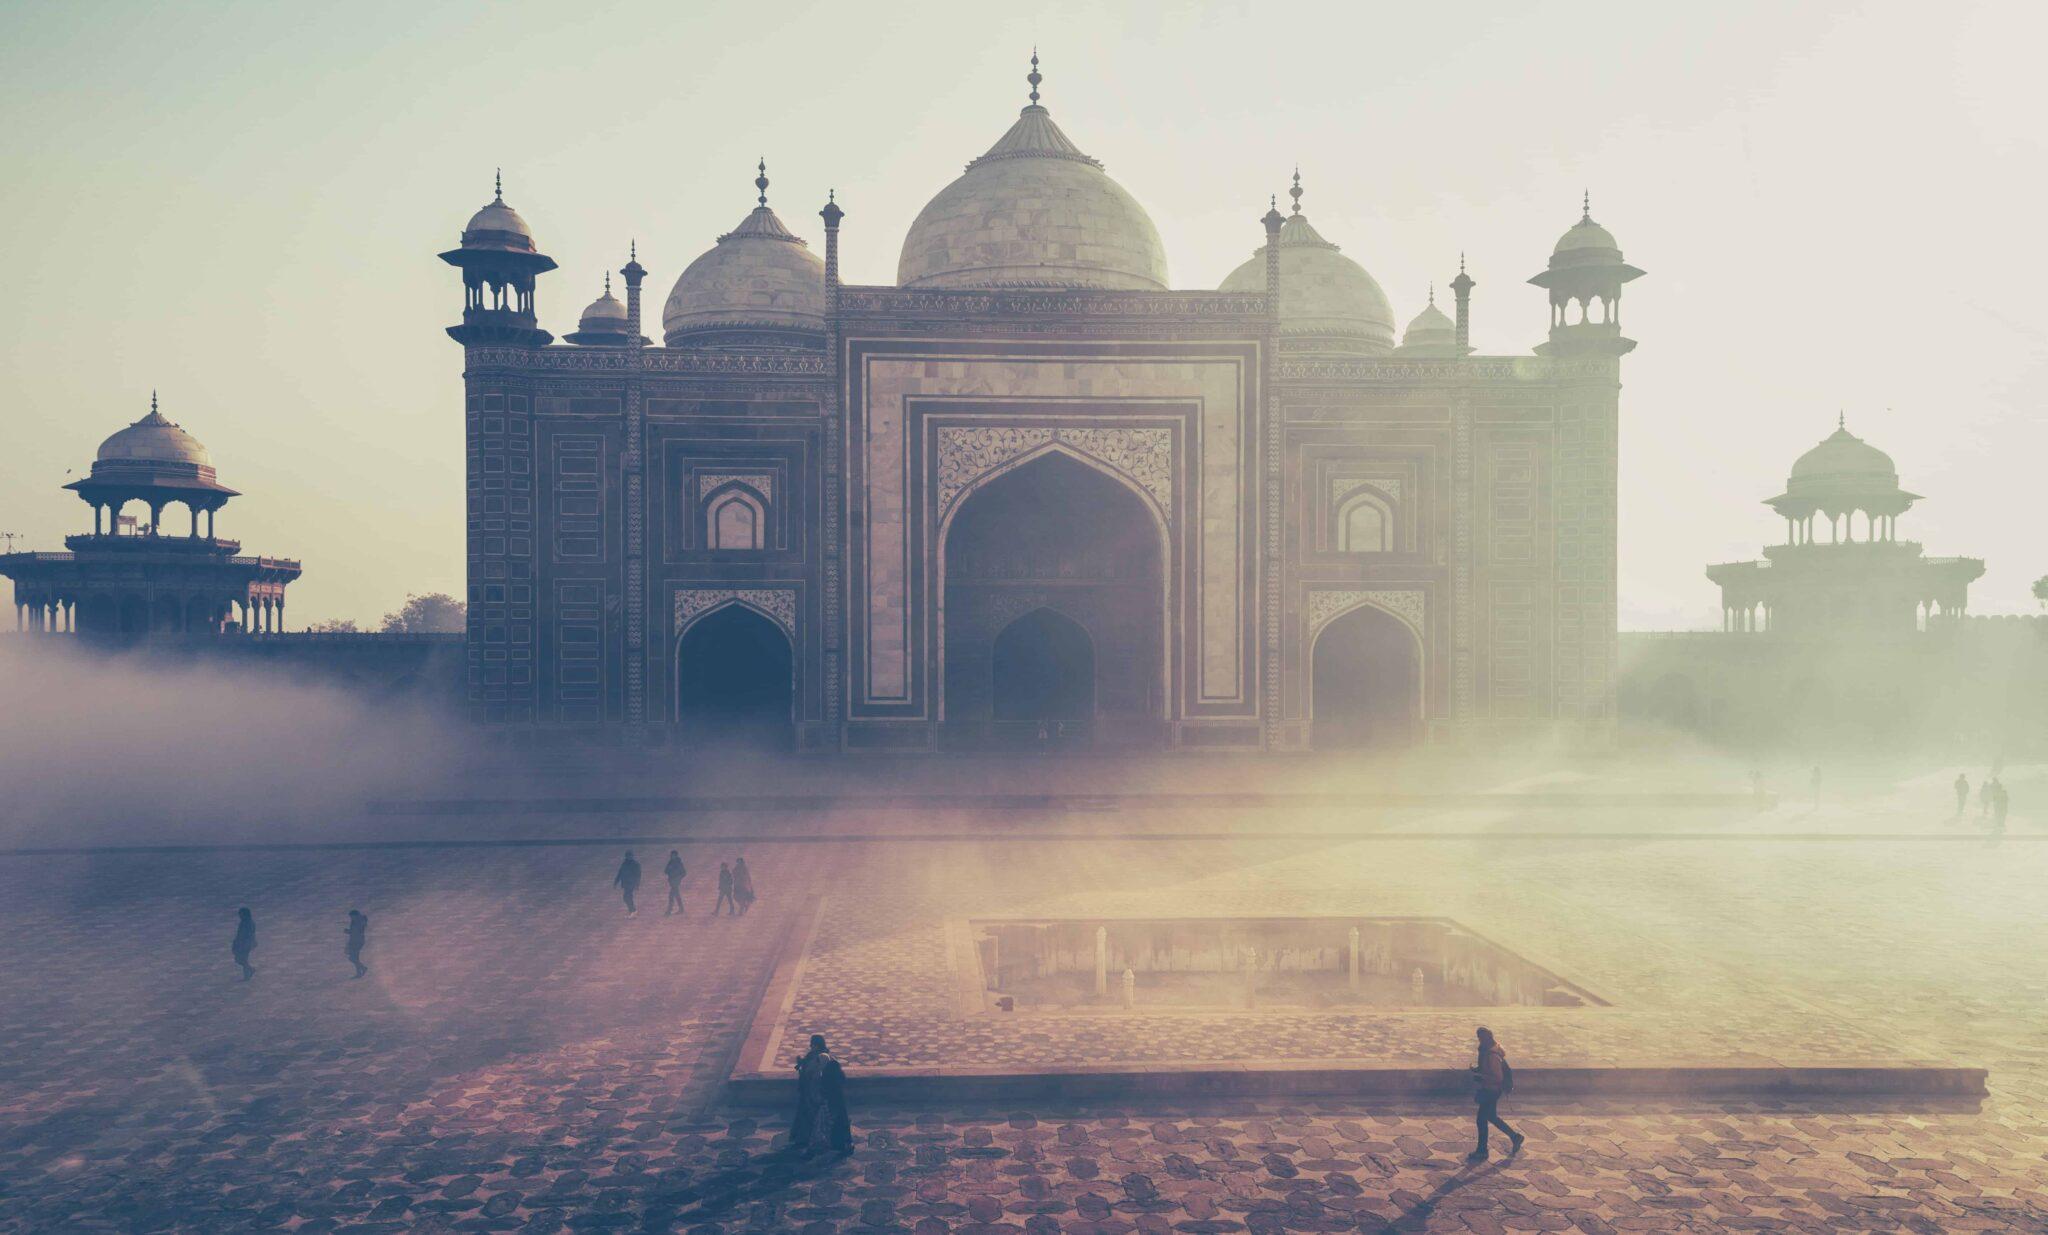 Heritage & Religious Buildings